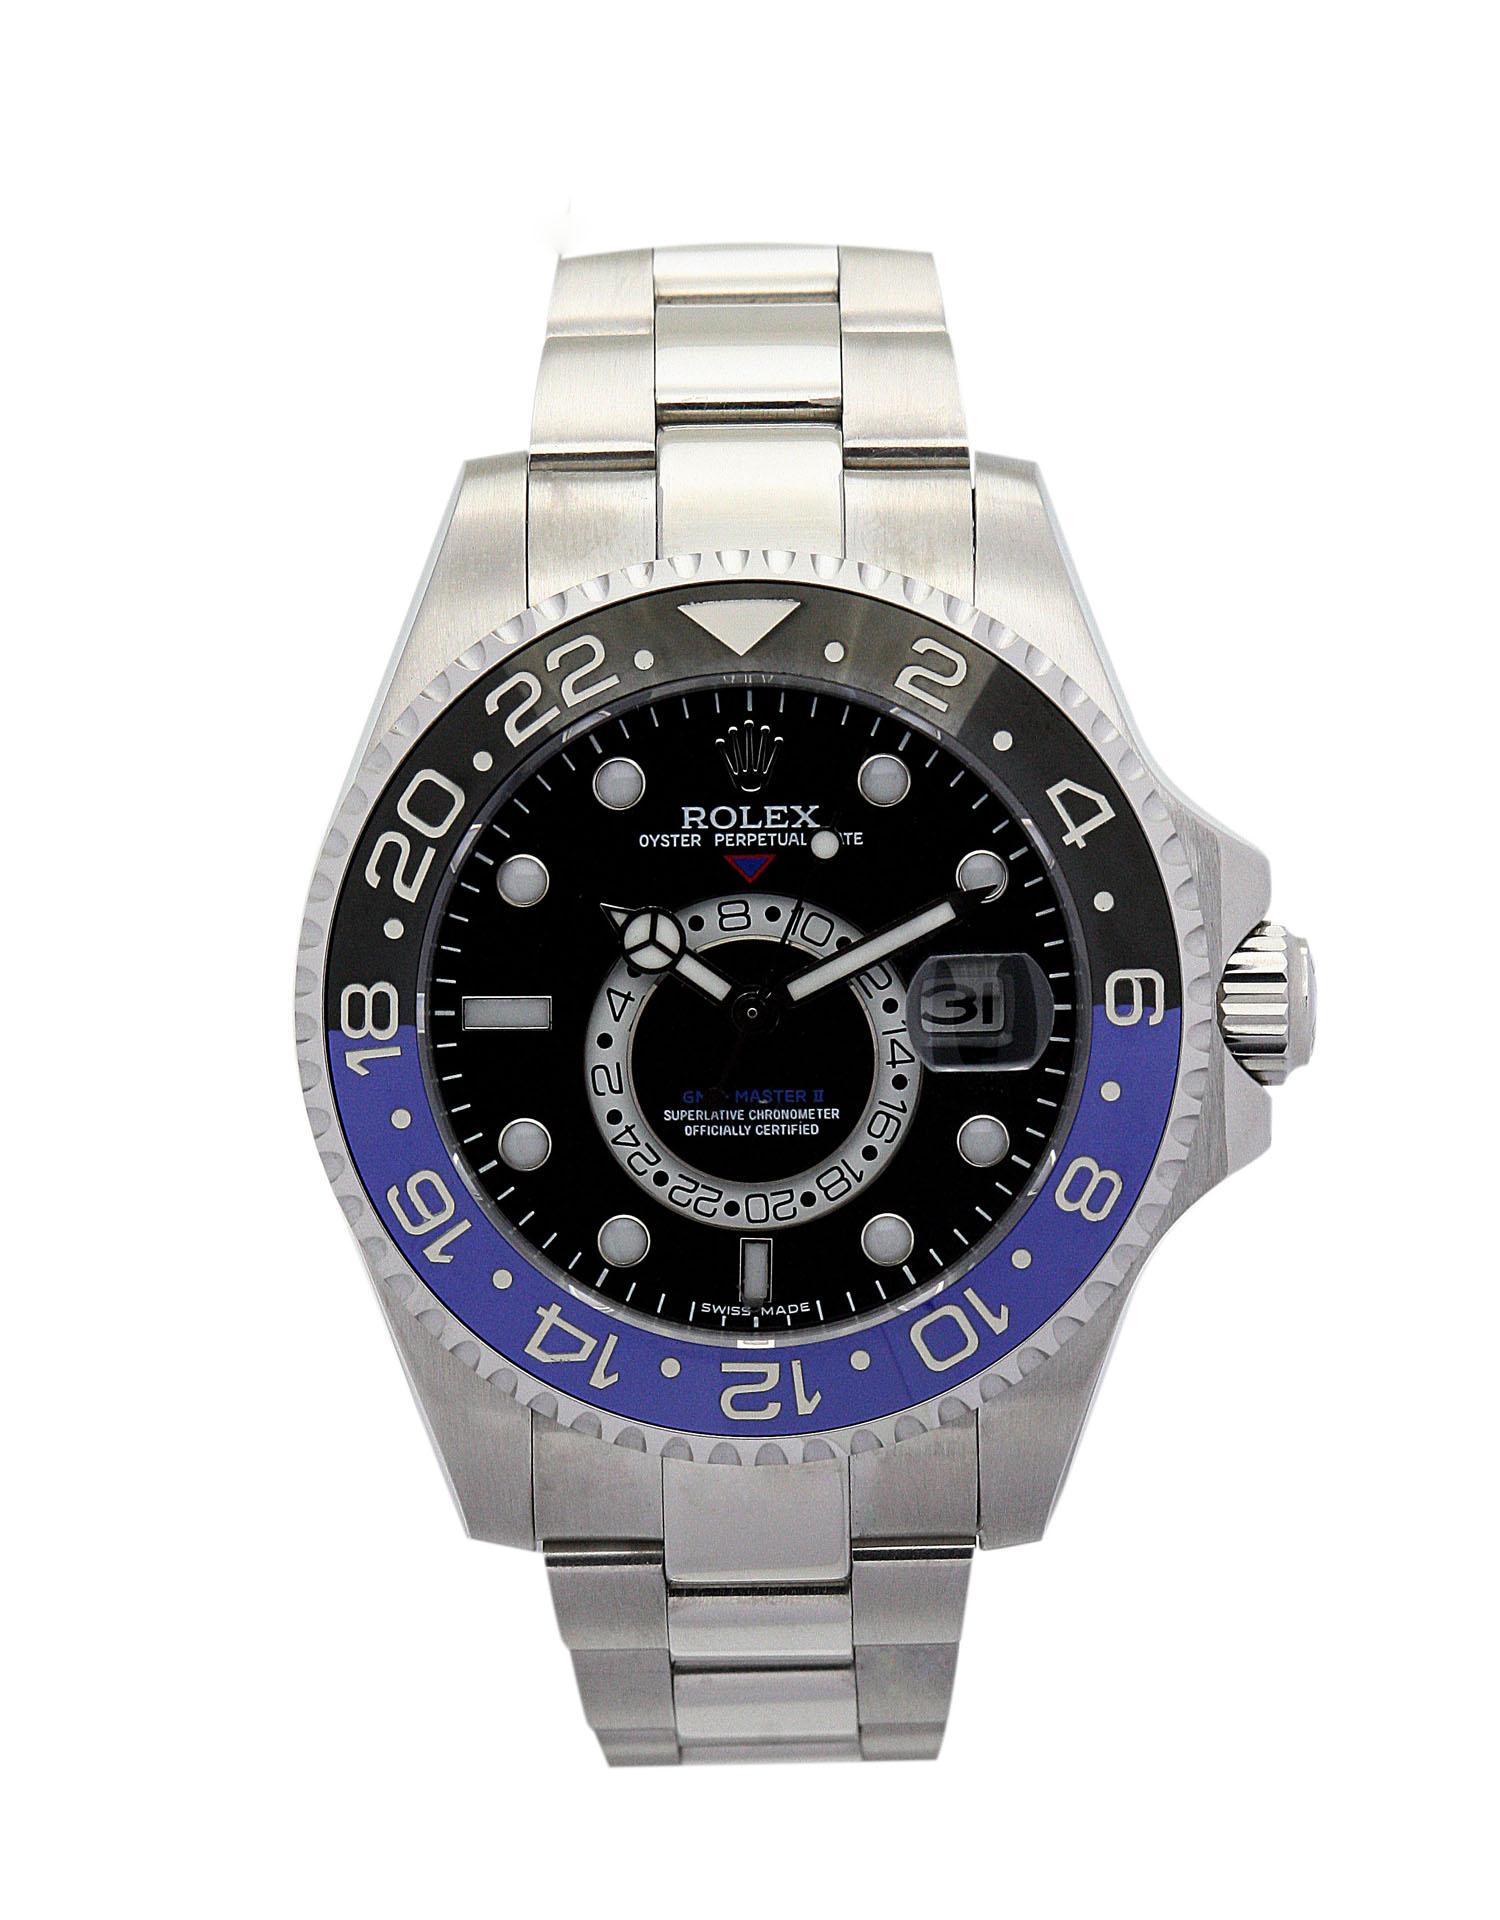 Rolex GMT Master 16720 40MM Black Dial width=500